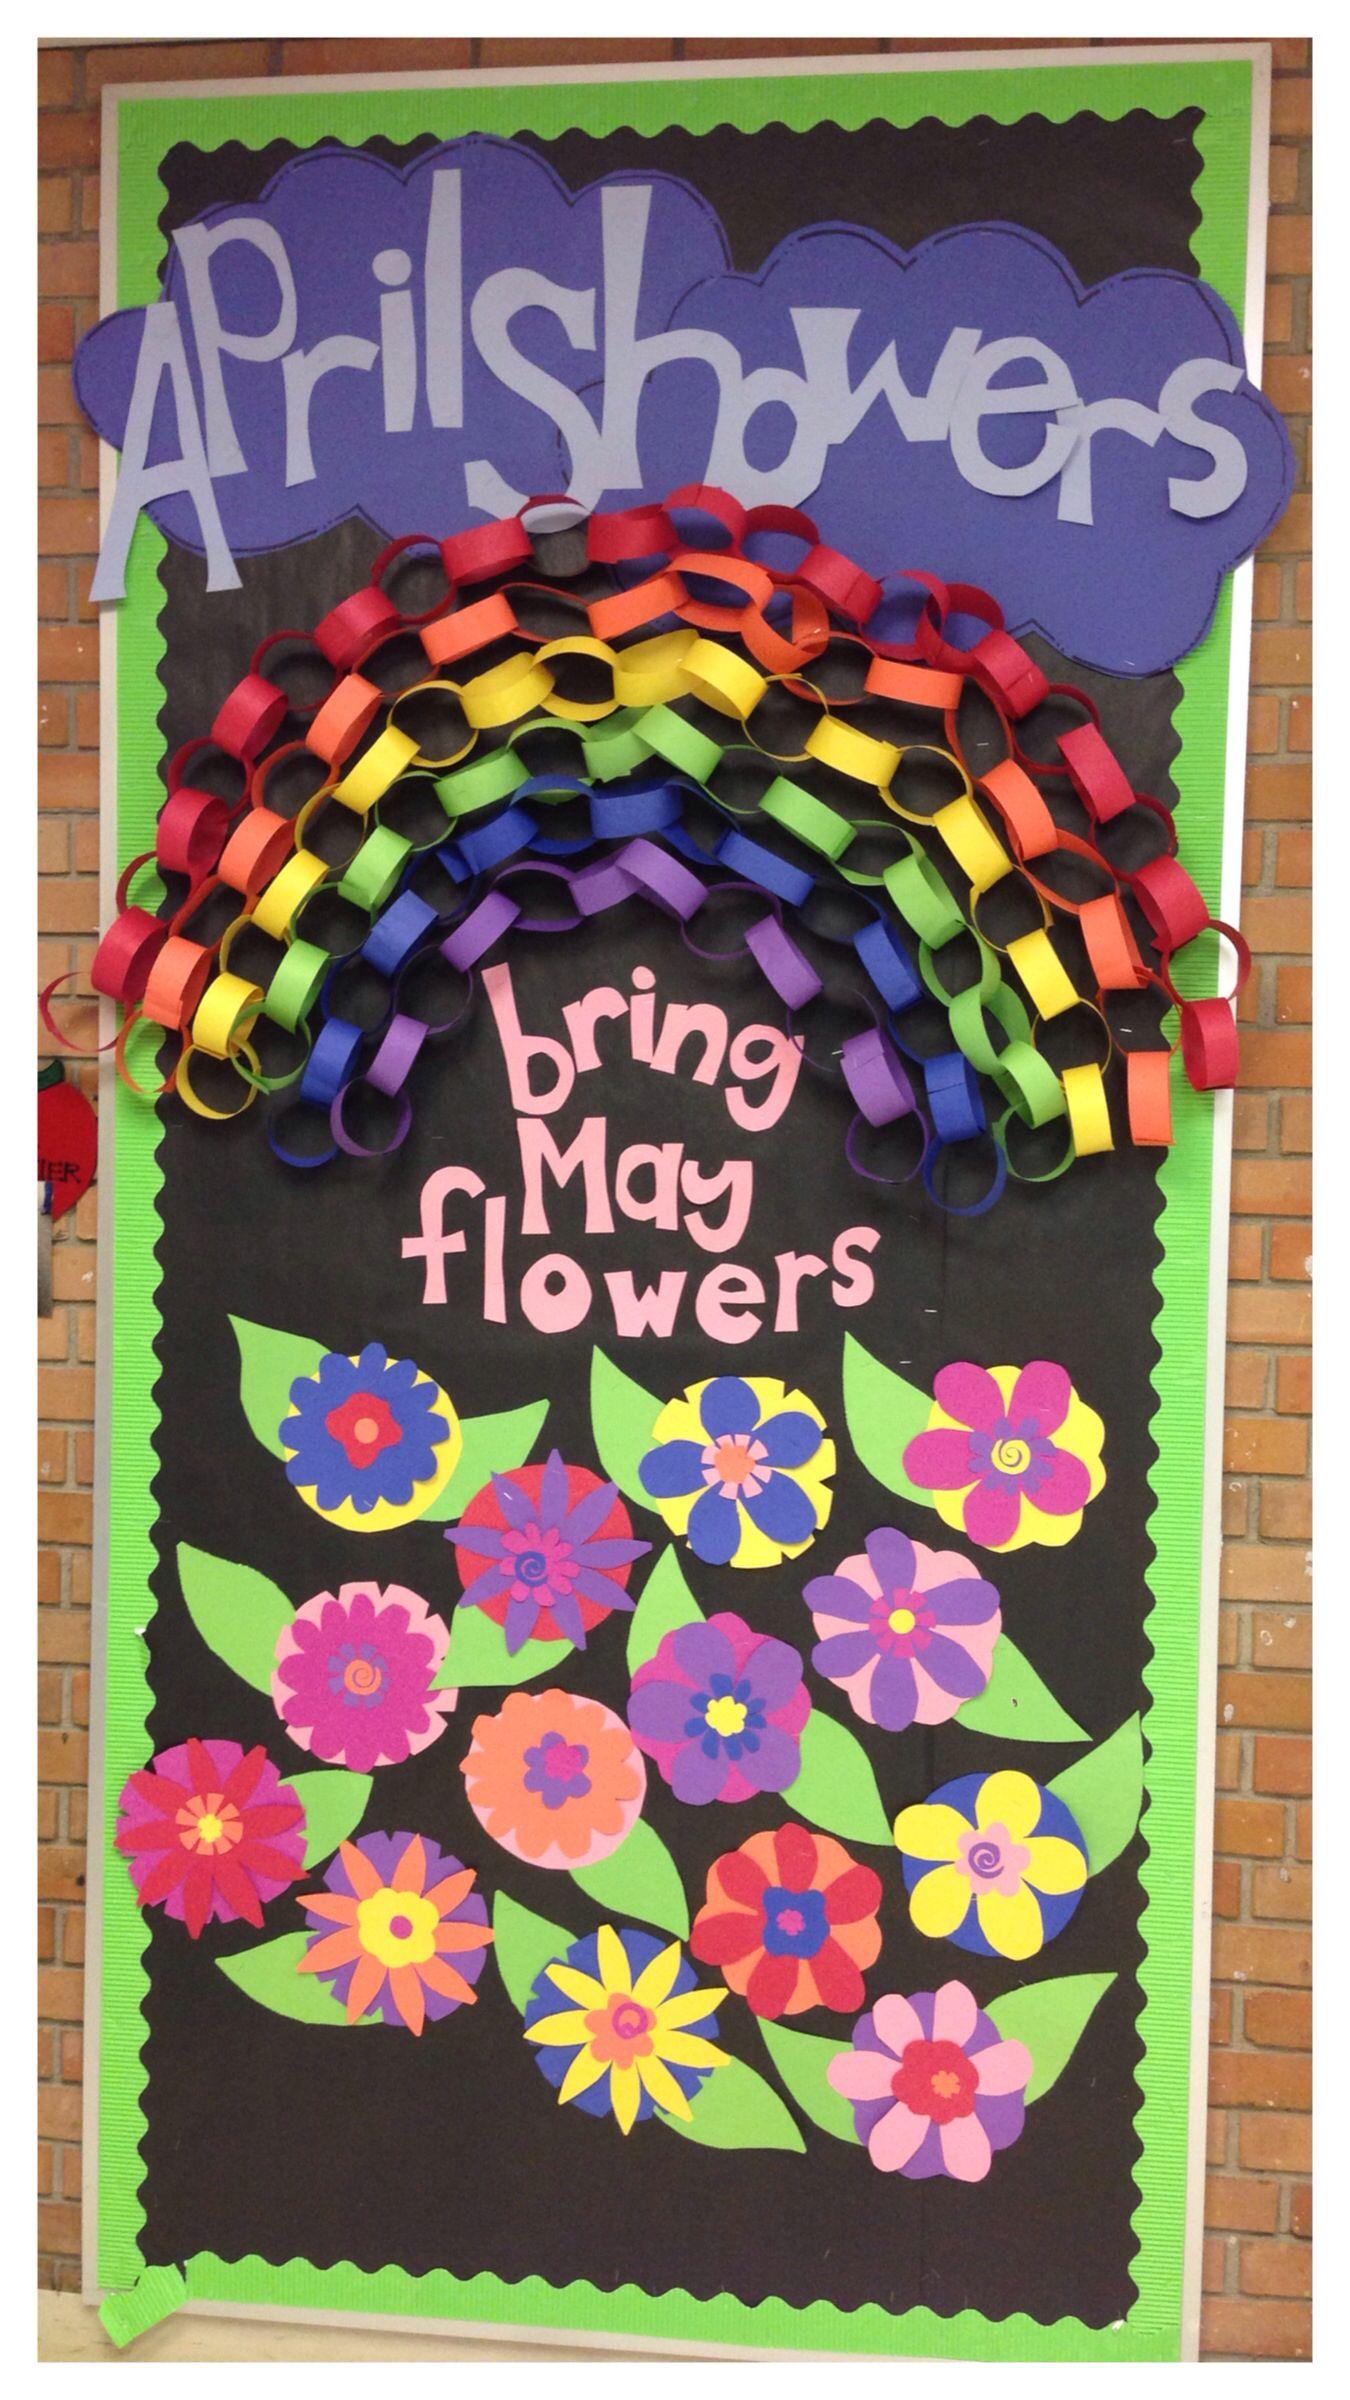 Pin By Andrea Gastmeier On School Bulletin Boards Spring Classroom Door Spring Classroom Door Decorations Classroom